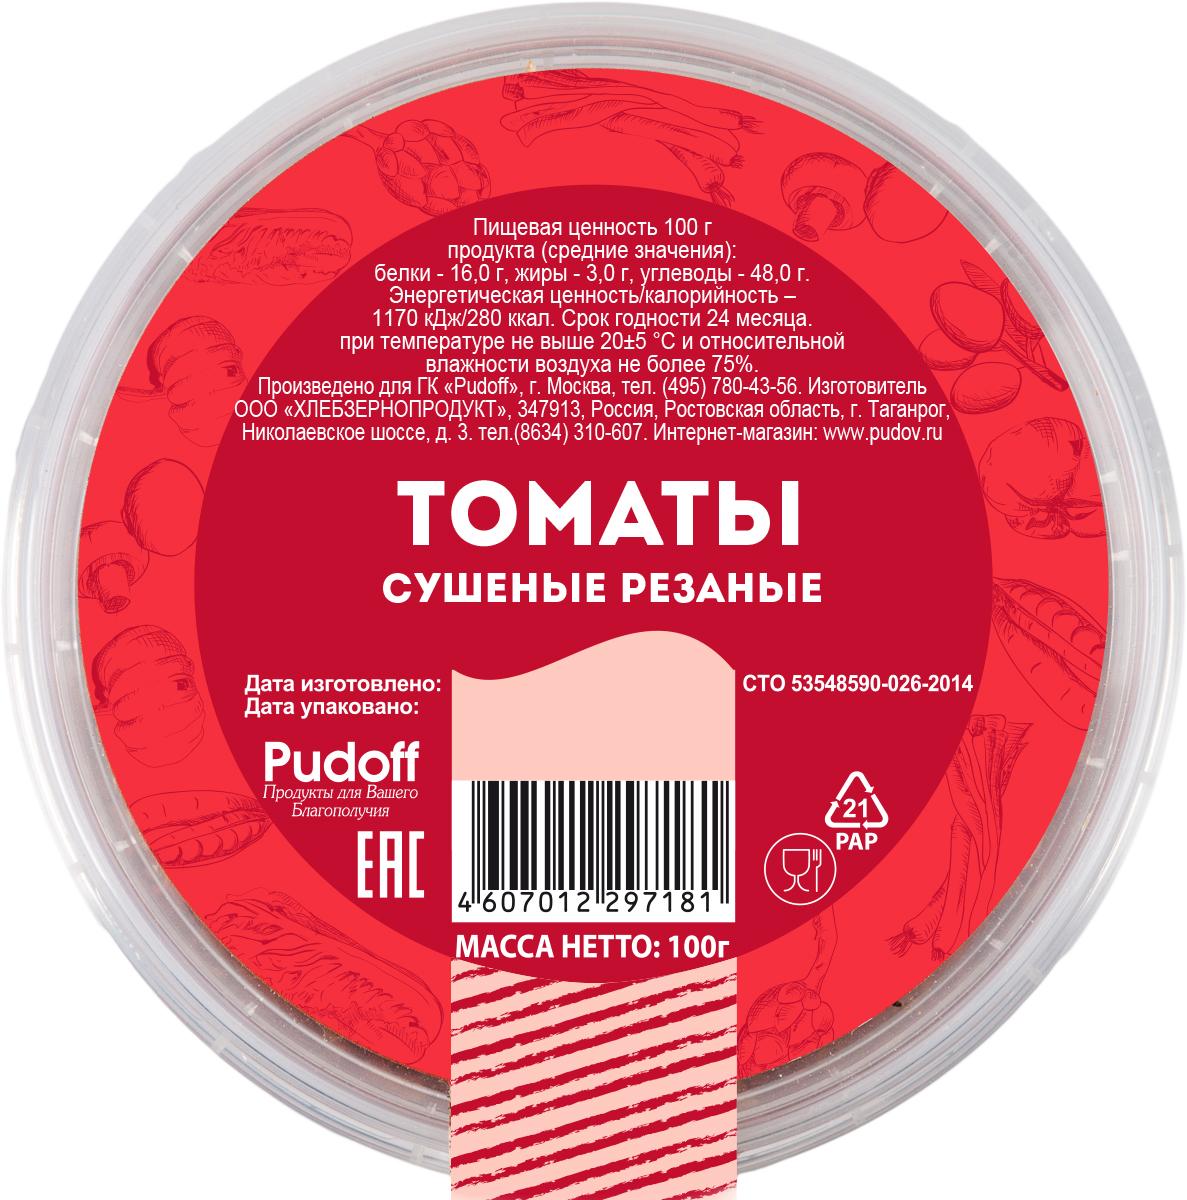 Пудовъ томаты сушеные резаные, 100 г